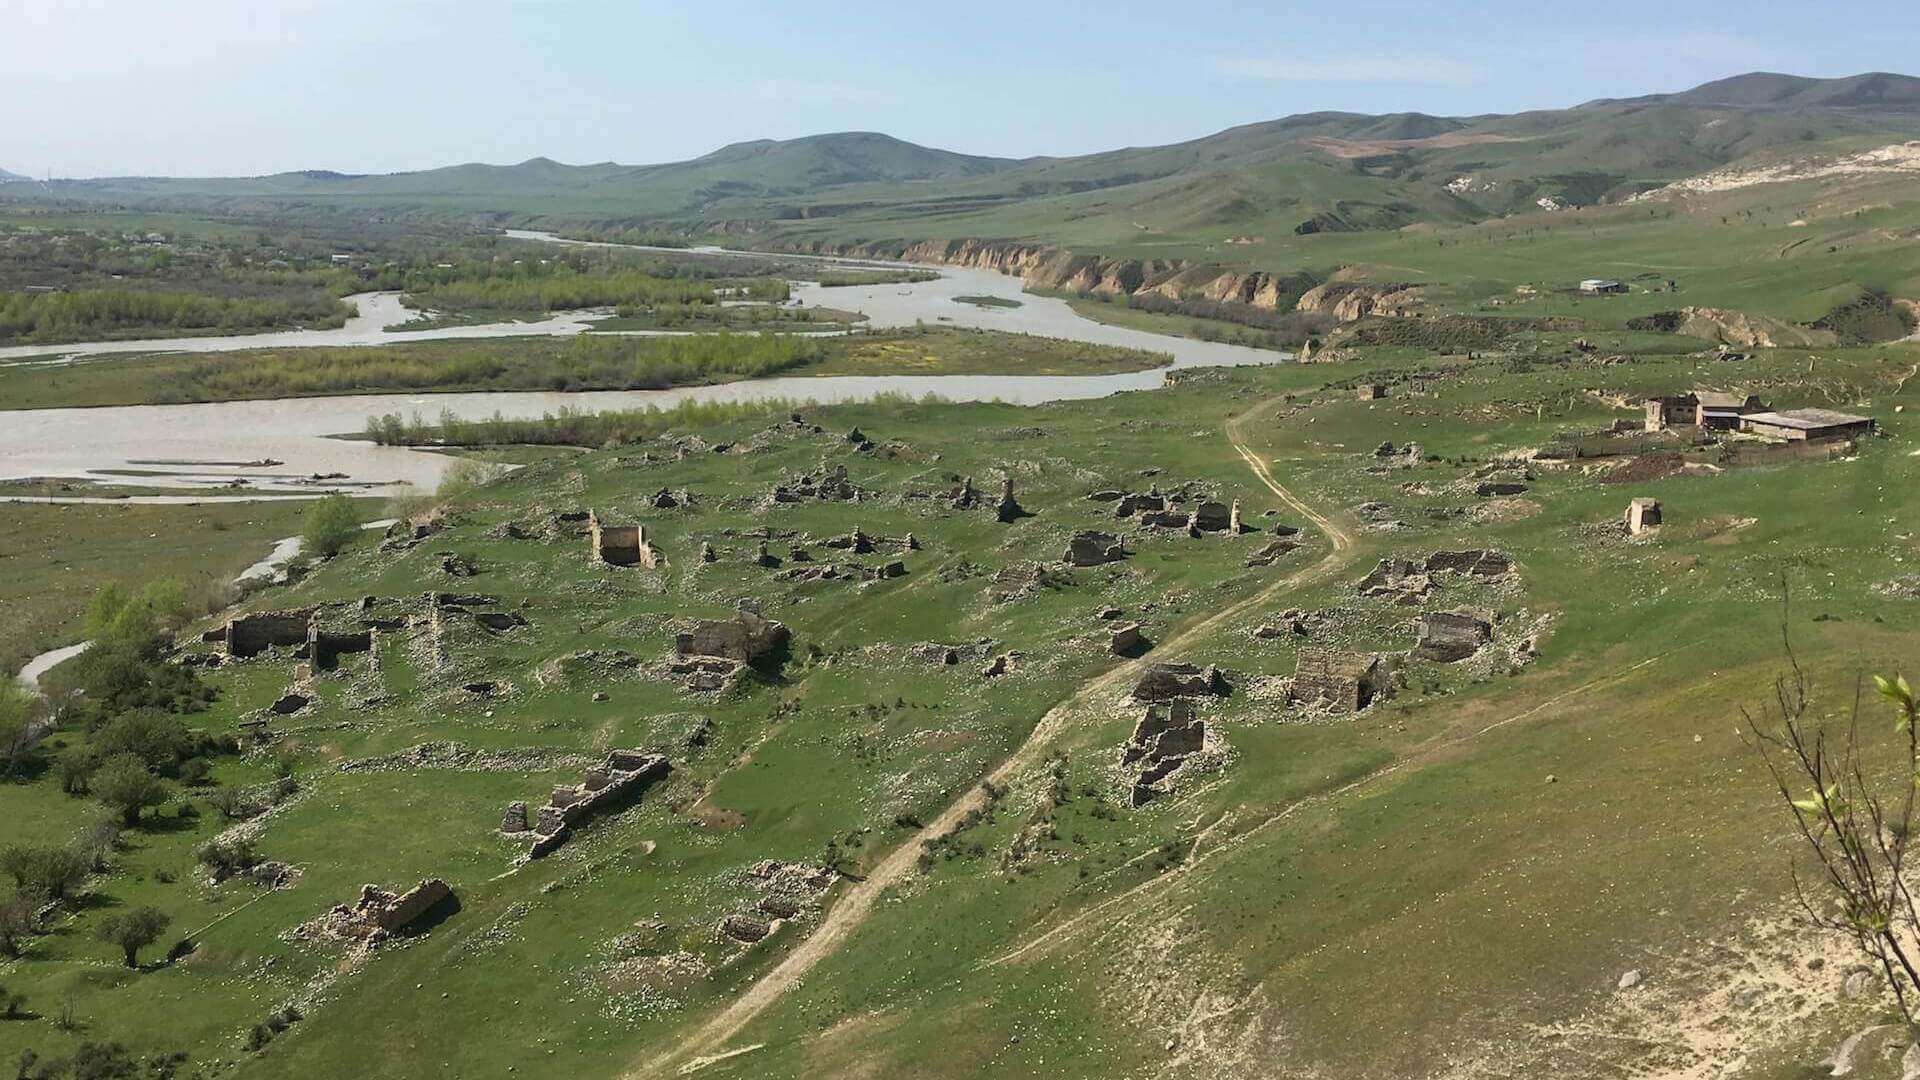 Verlaten woningen in de oude stad Uplistsikhe in Georgië